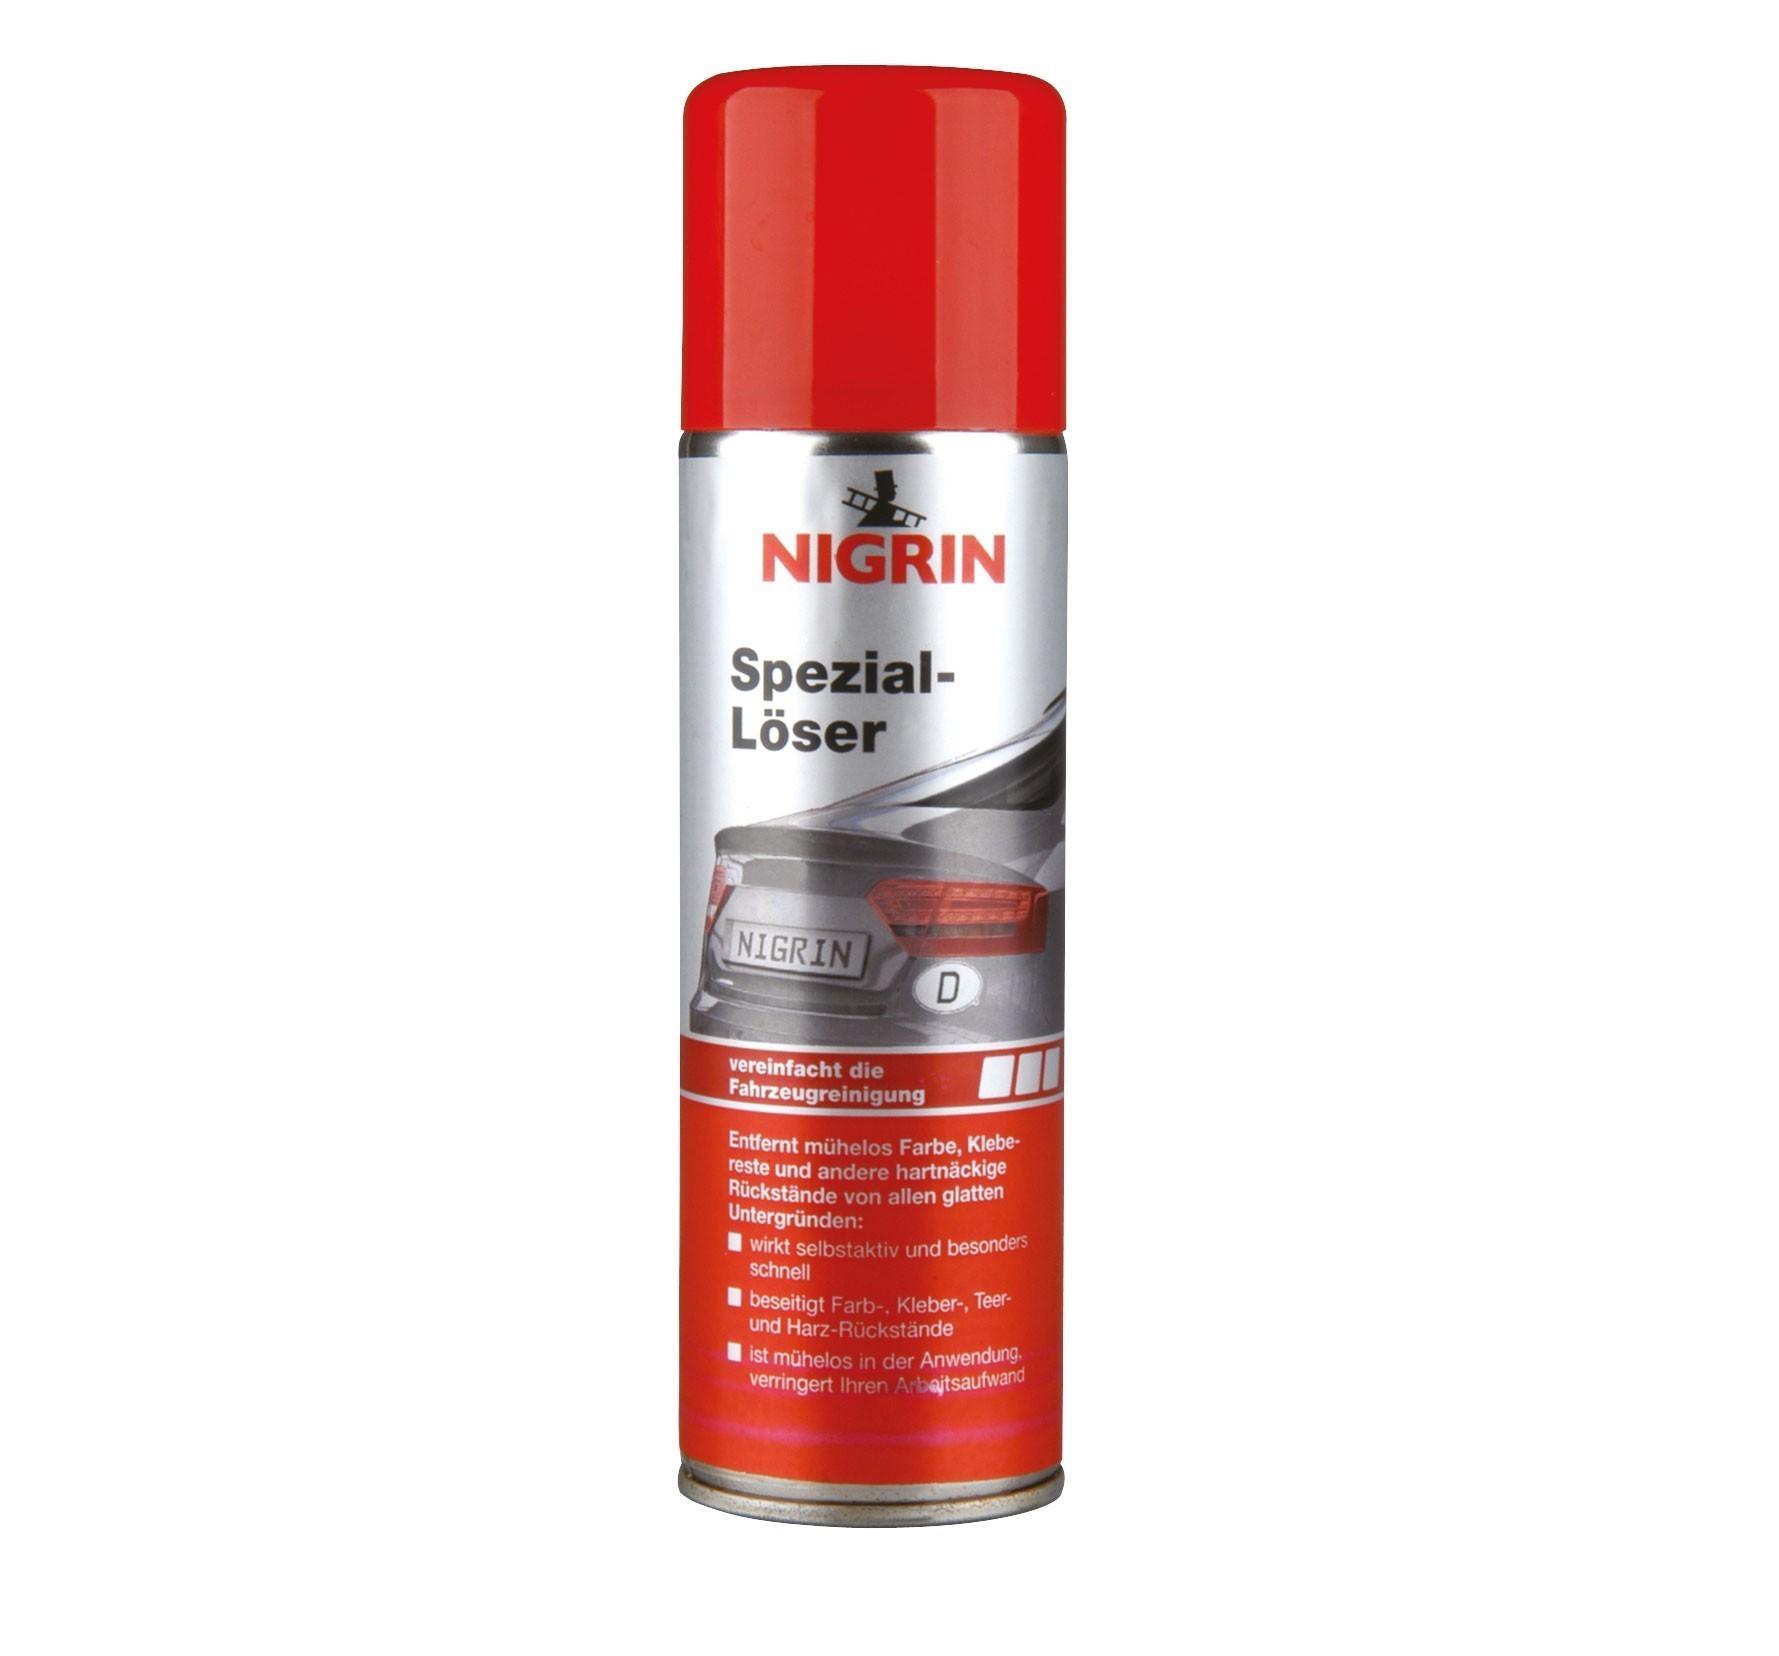 Nigrin Spezial-Löser 300ml Bild 1